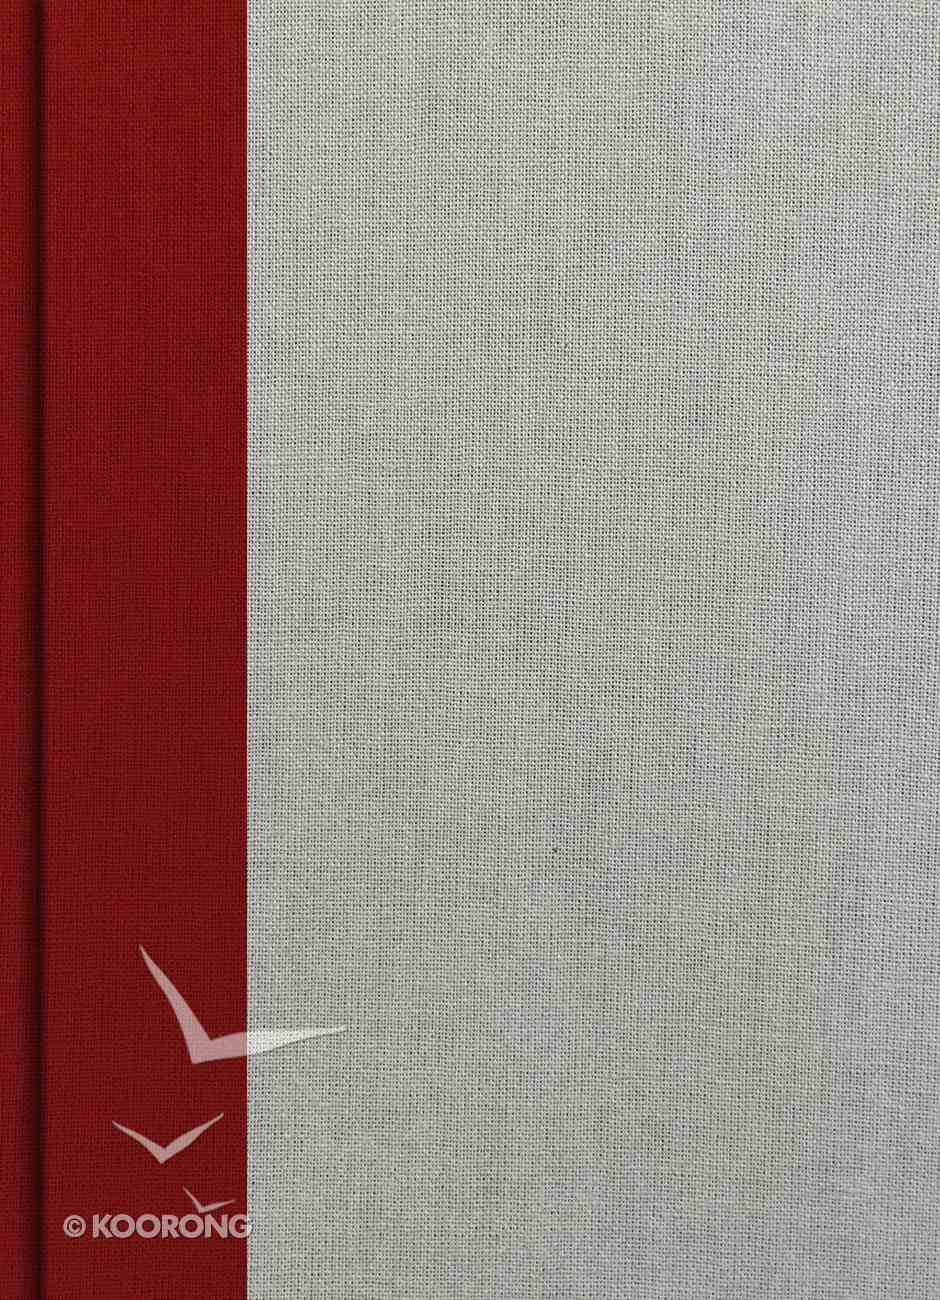 NKJV Holman Study Bible Crimson/Gray Indexed Hardback